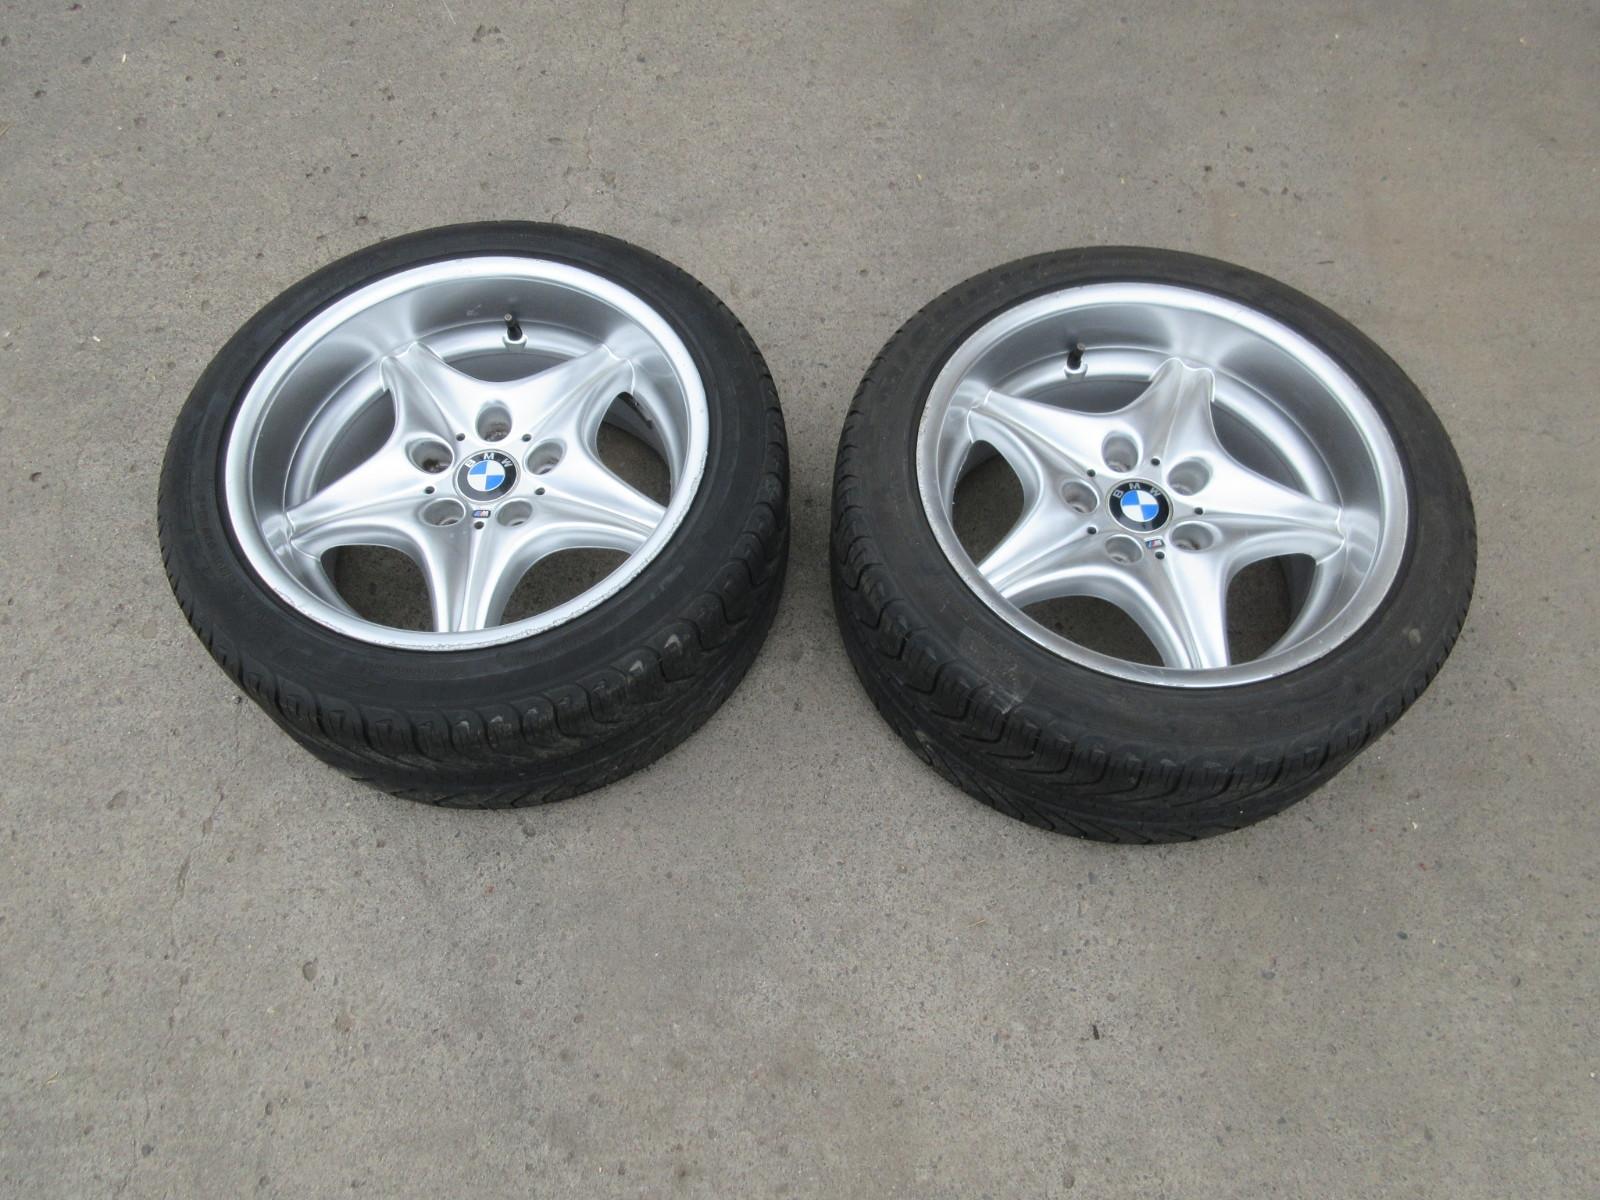 Bmw Z3 M Roadster E36 Style 40 Oem Rear 17 Wheels Tires 36112228060 Pk Auto Parts Inc